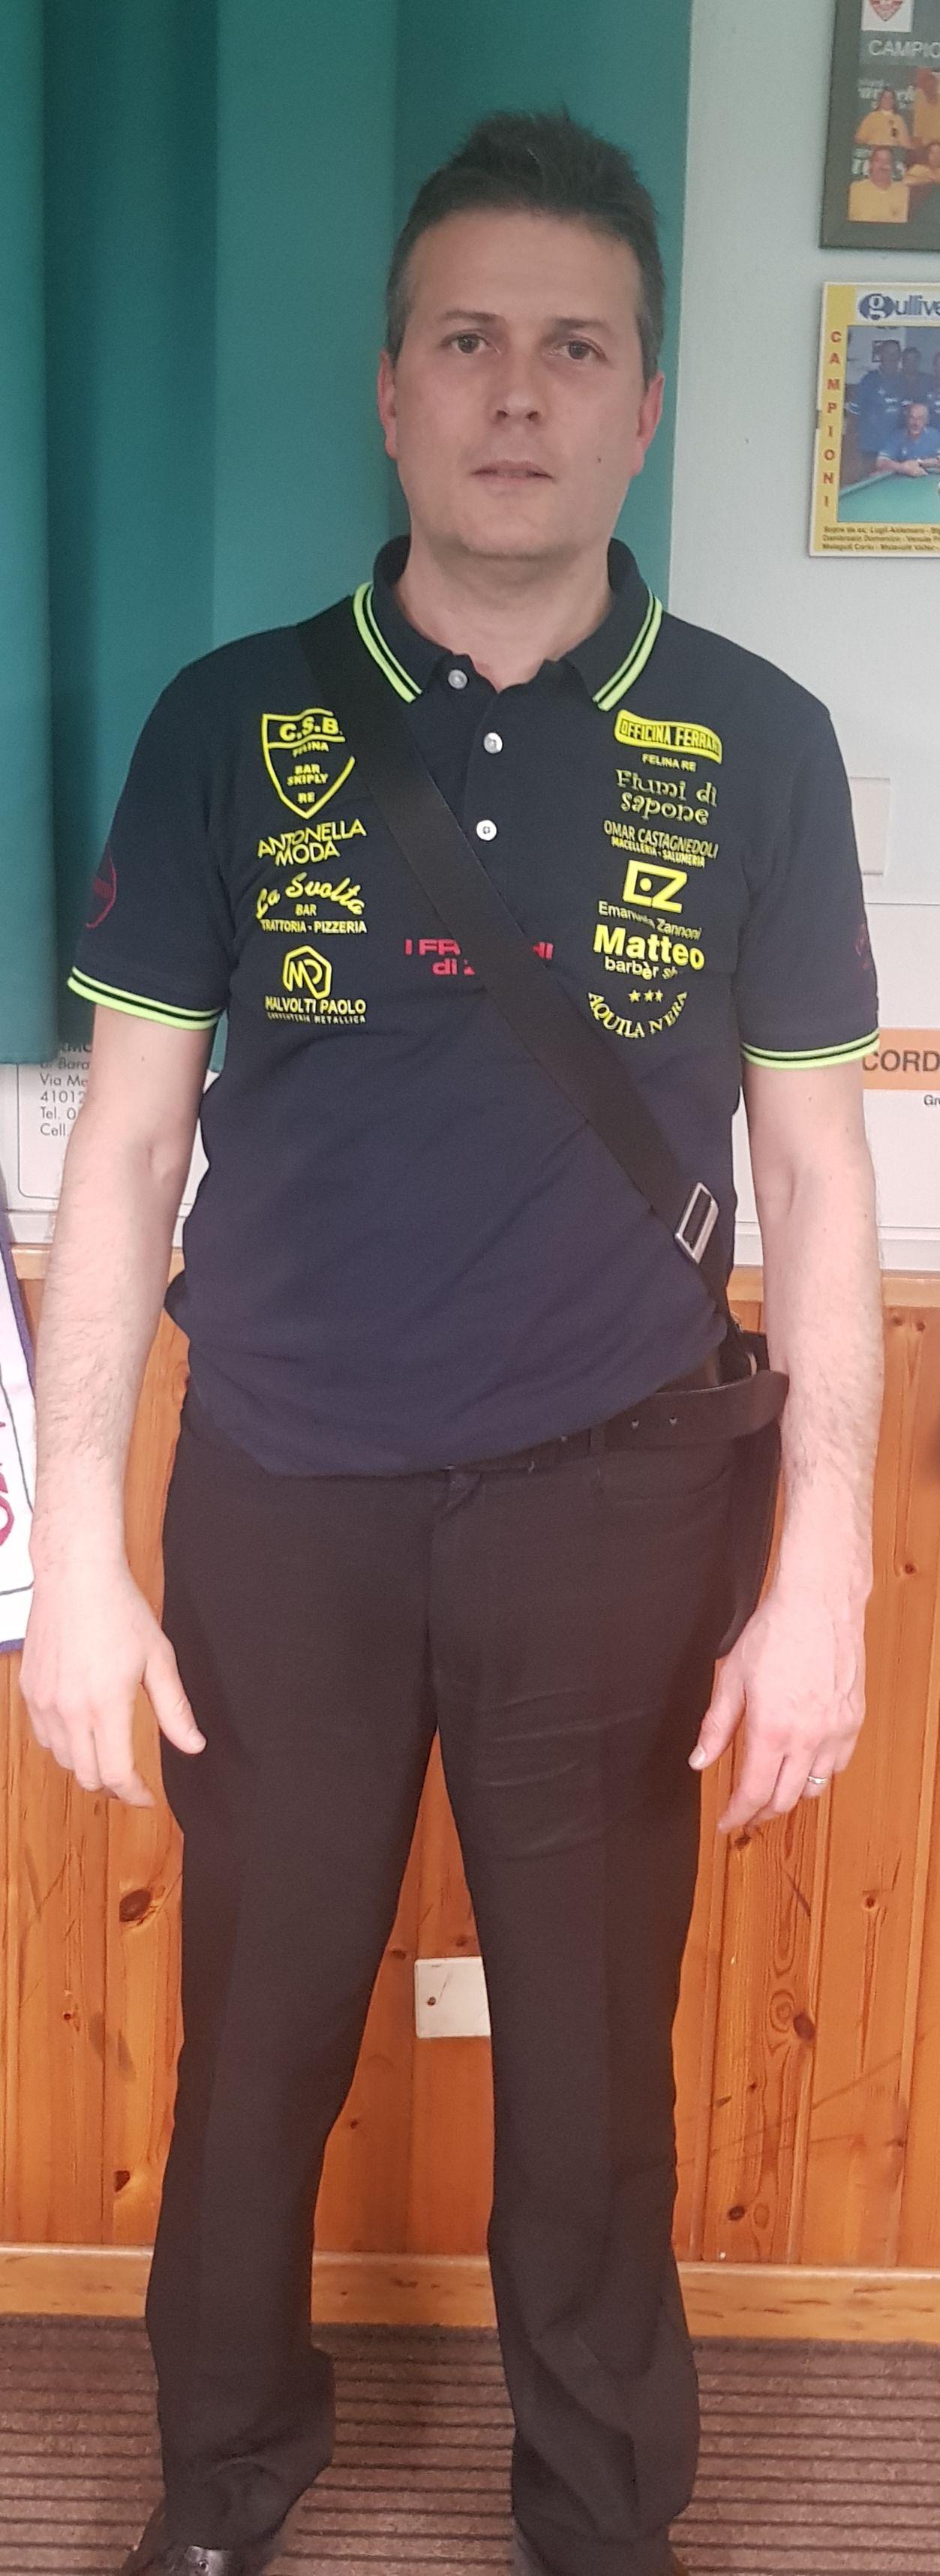 Fabio Arleoni 5^ class.